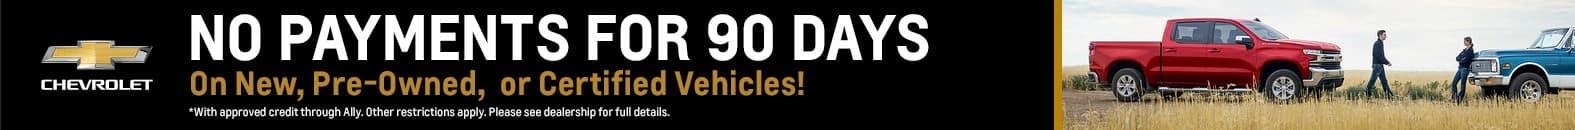 No Payments For 90 Days | Bert Ogden Chevrolet | Mission, TX